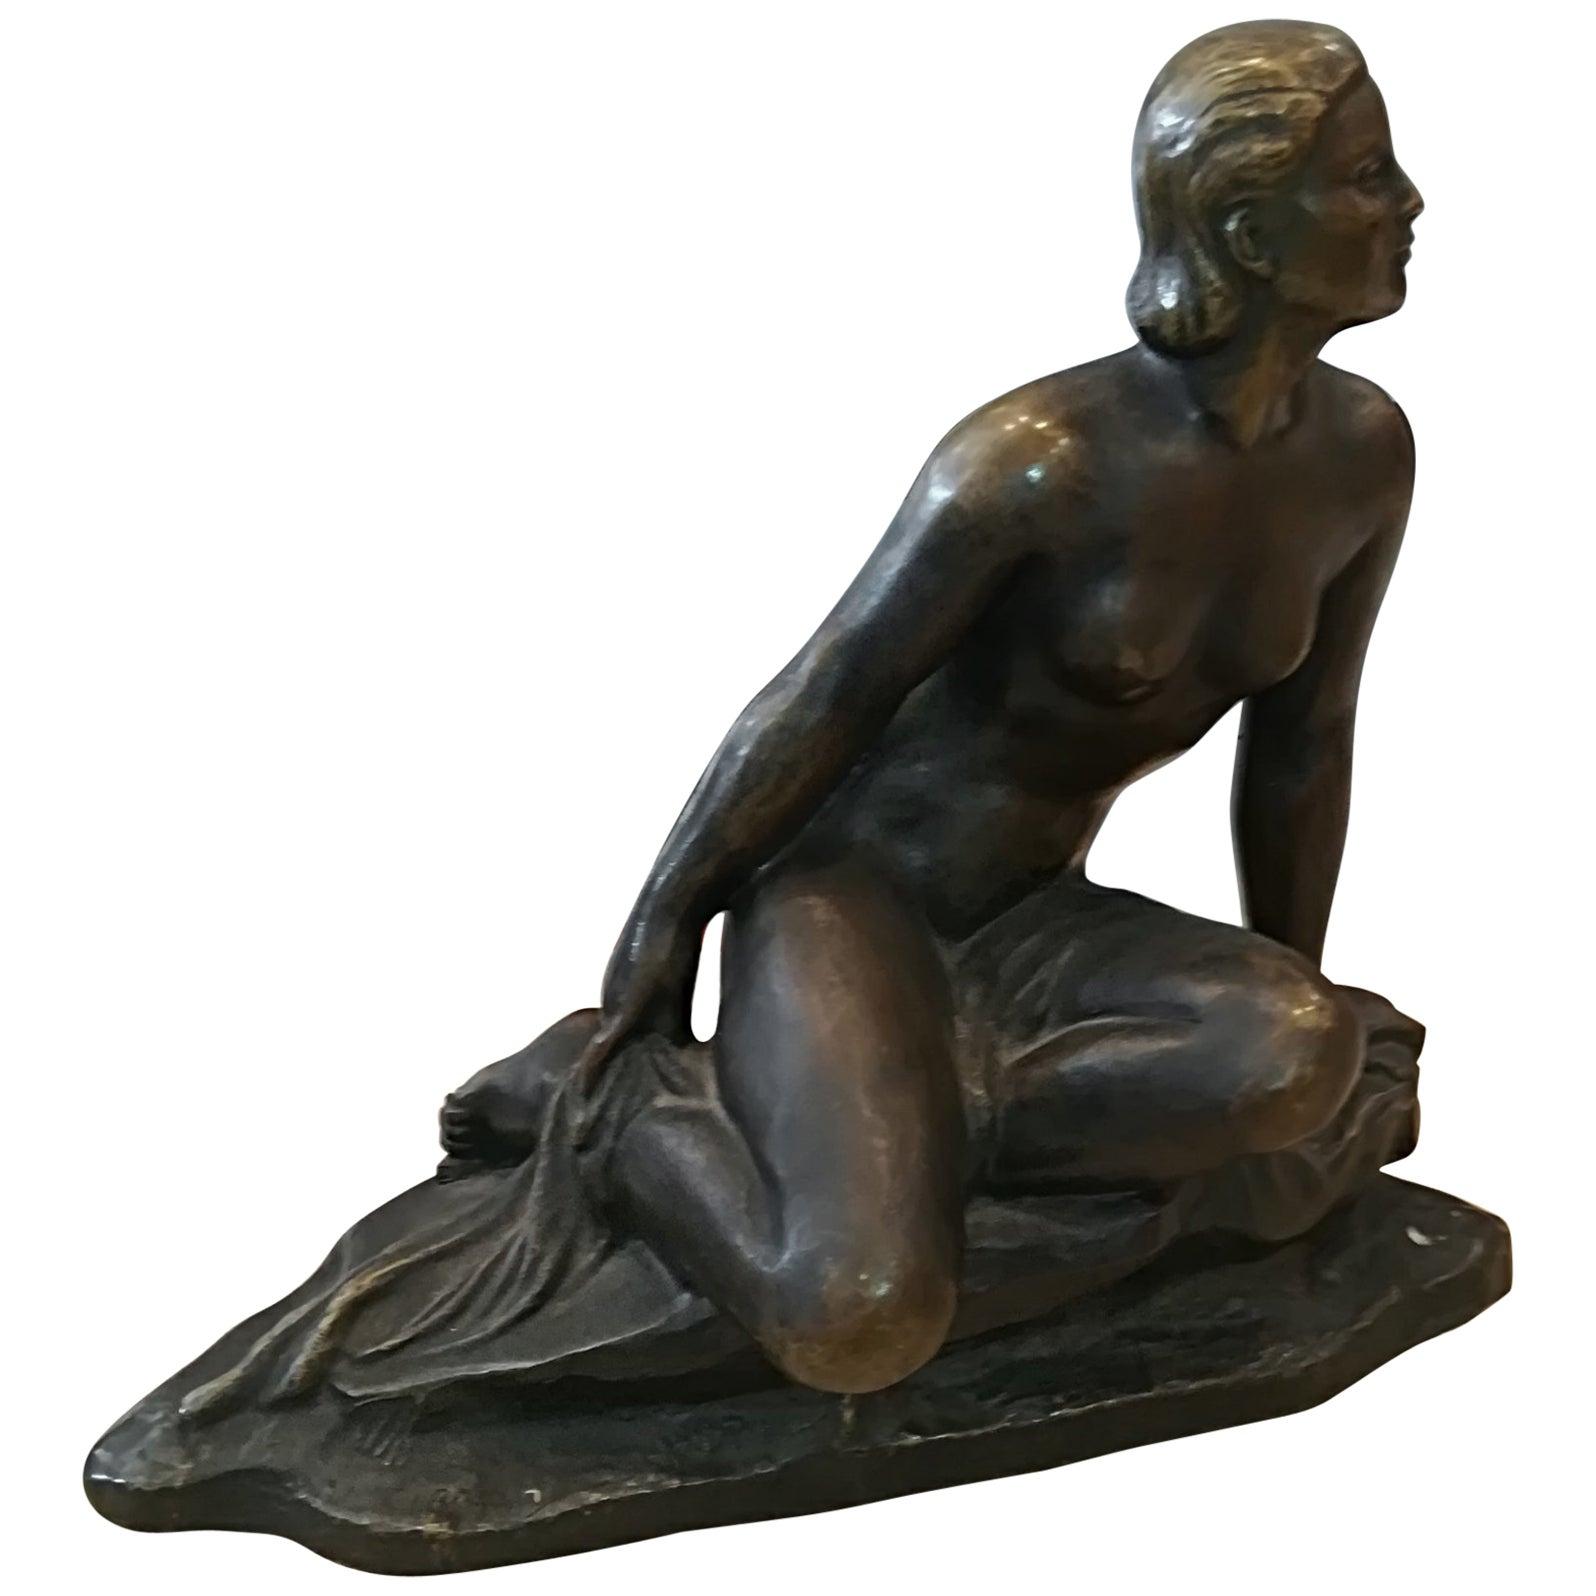 Art Deco Ugo Cipriani Bronze Sculpture, circa 1930